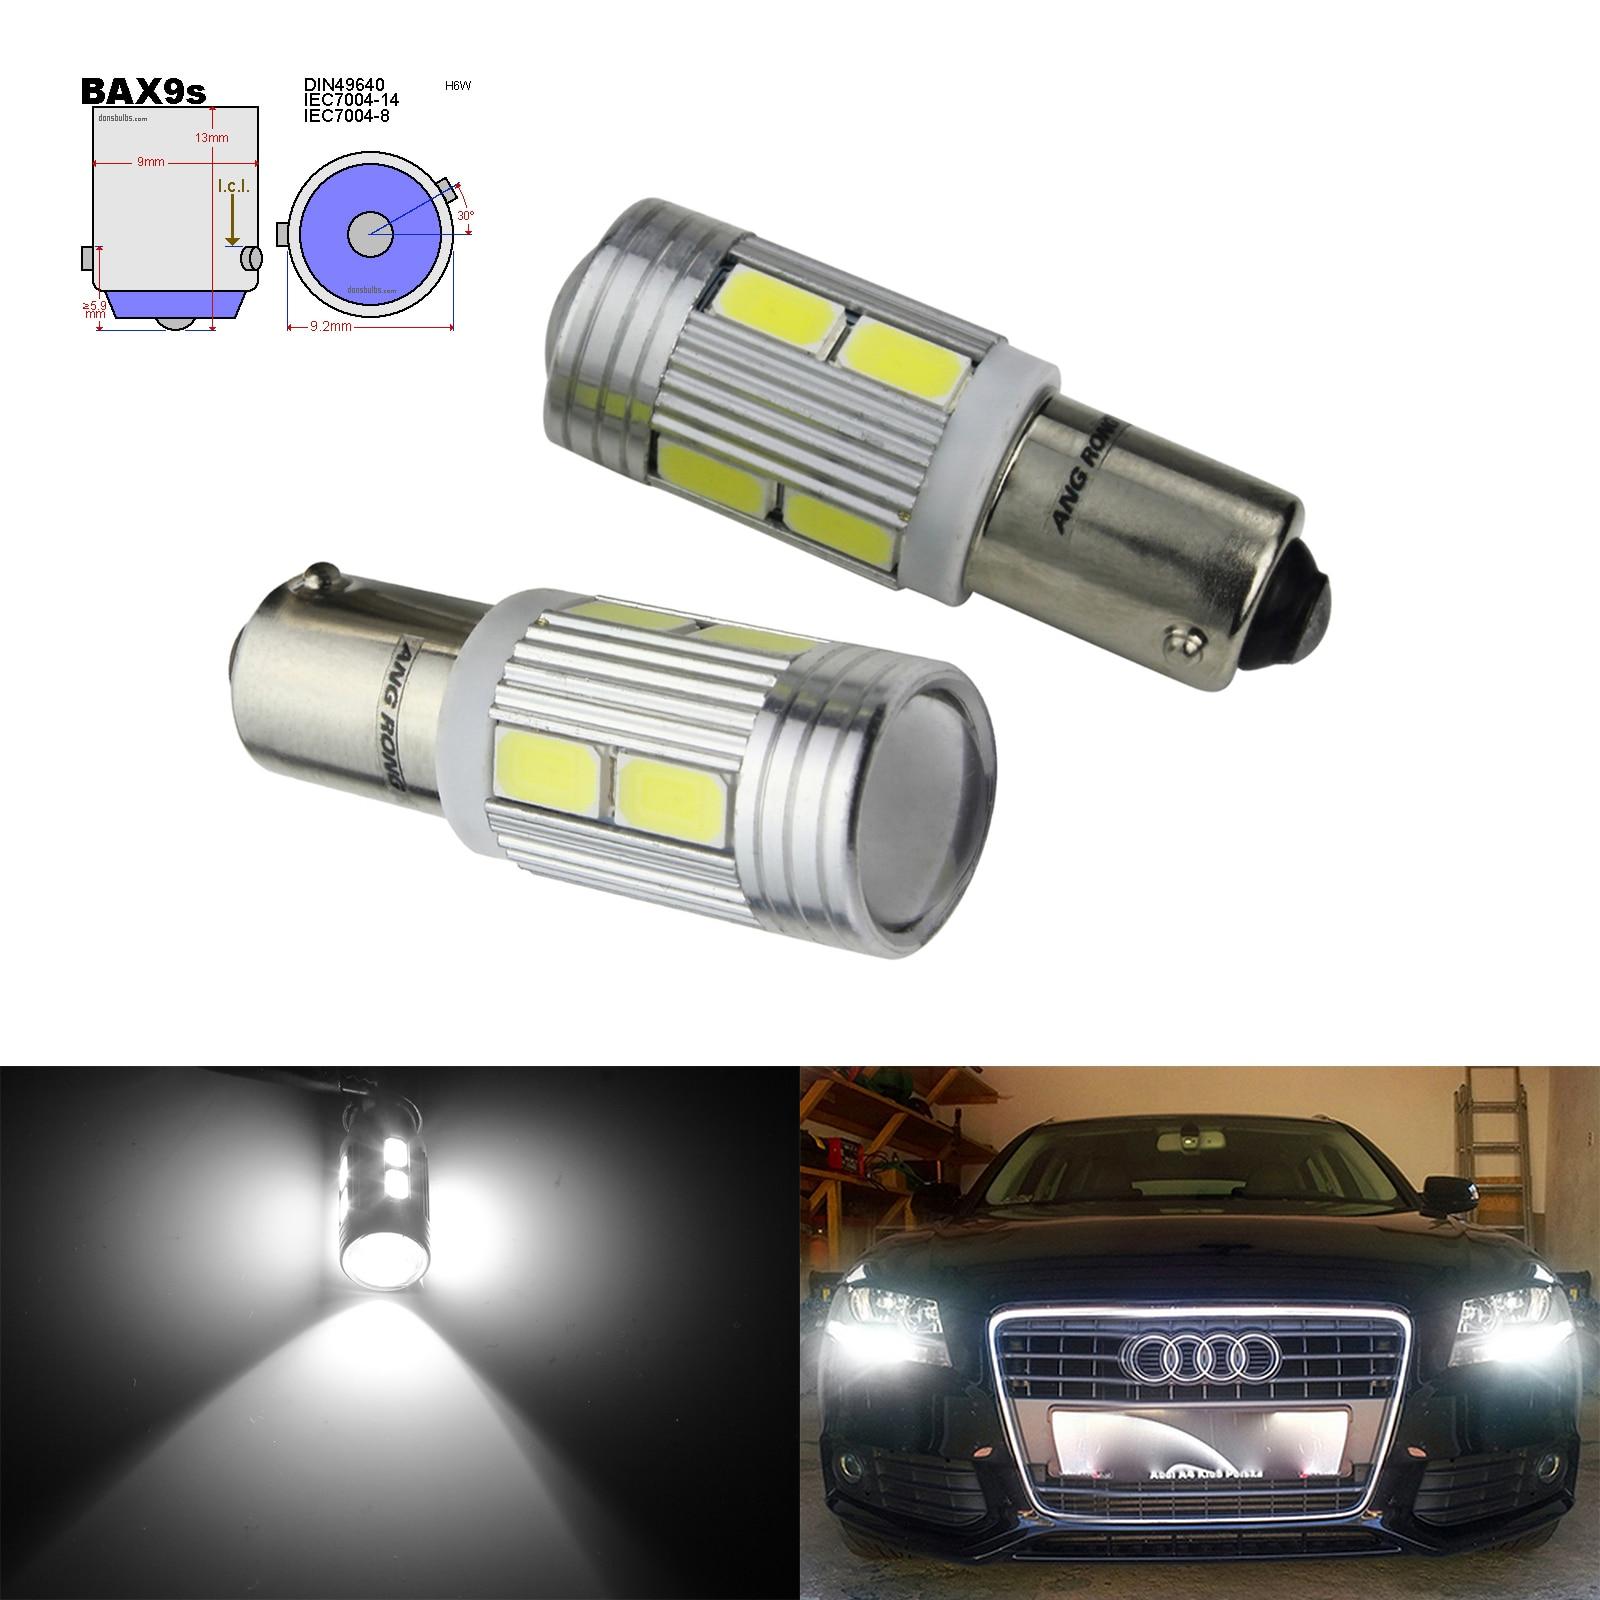 2x LED HID XENON WHITE SIDE LIGHT 433 434 H6W BAX9S OFFSET CAP UK FREE P/&P